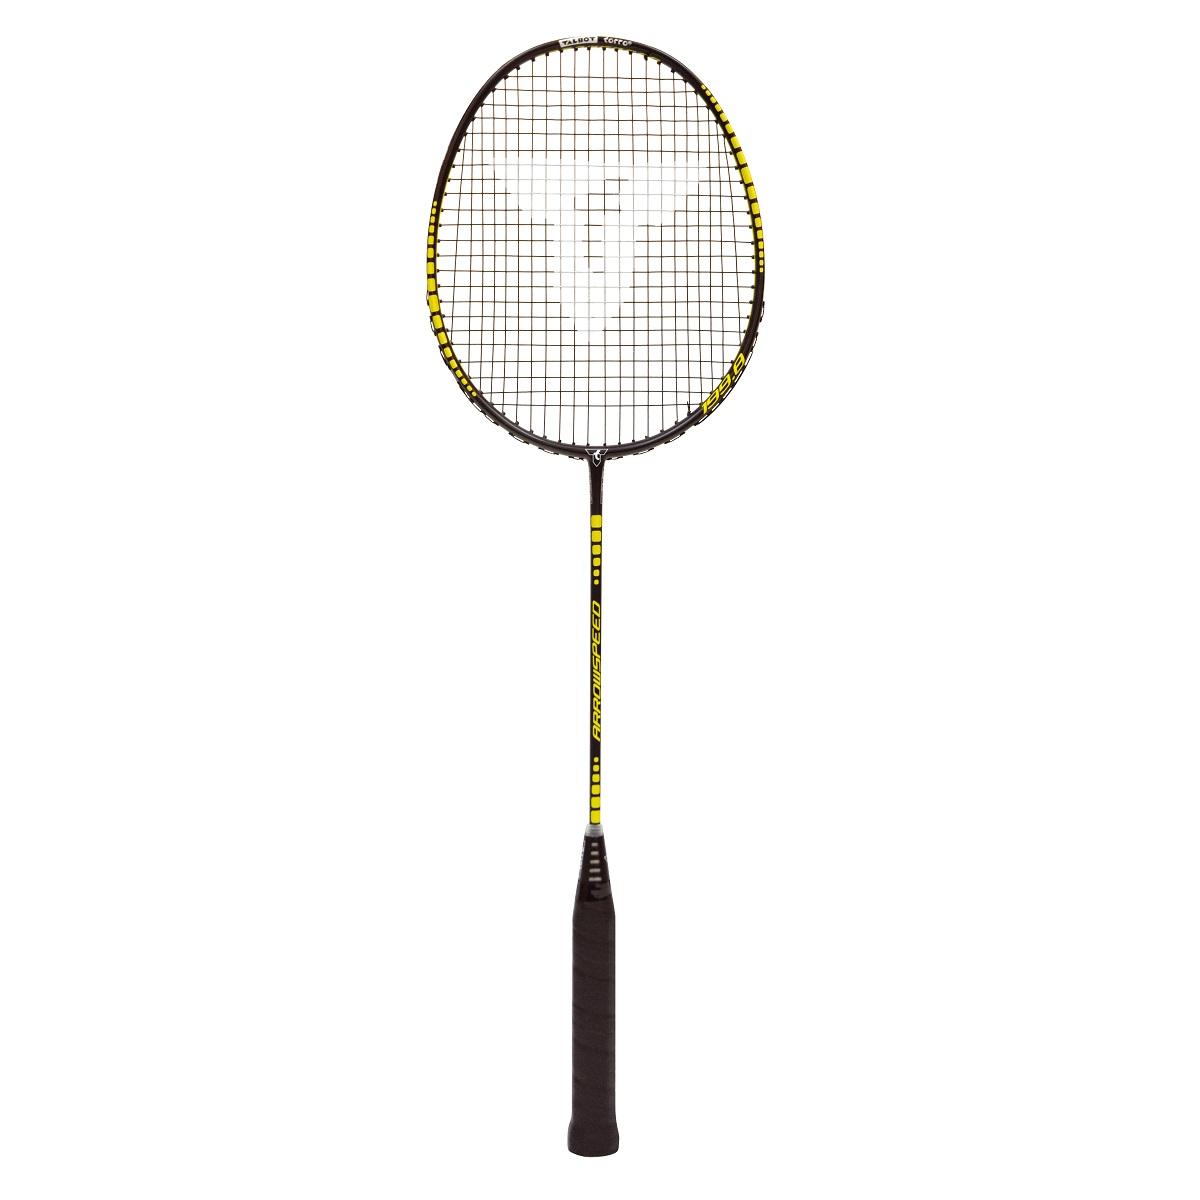 Badmintonová raketa TALBOT TORRO Arrowspeed 199.8